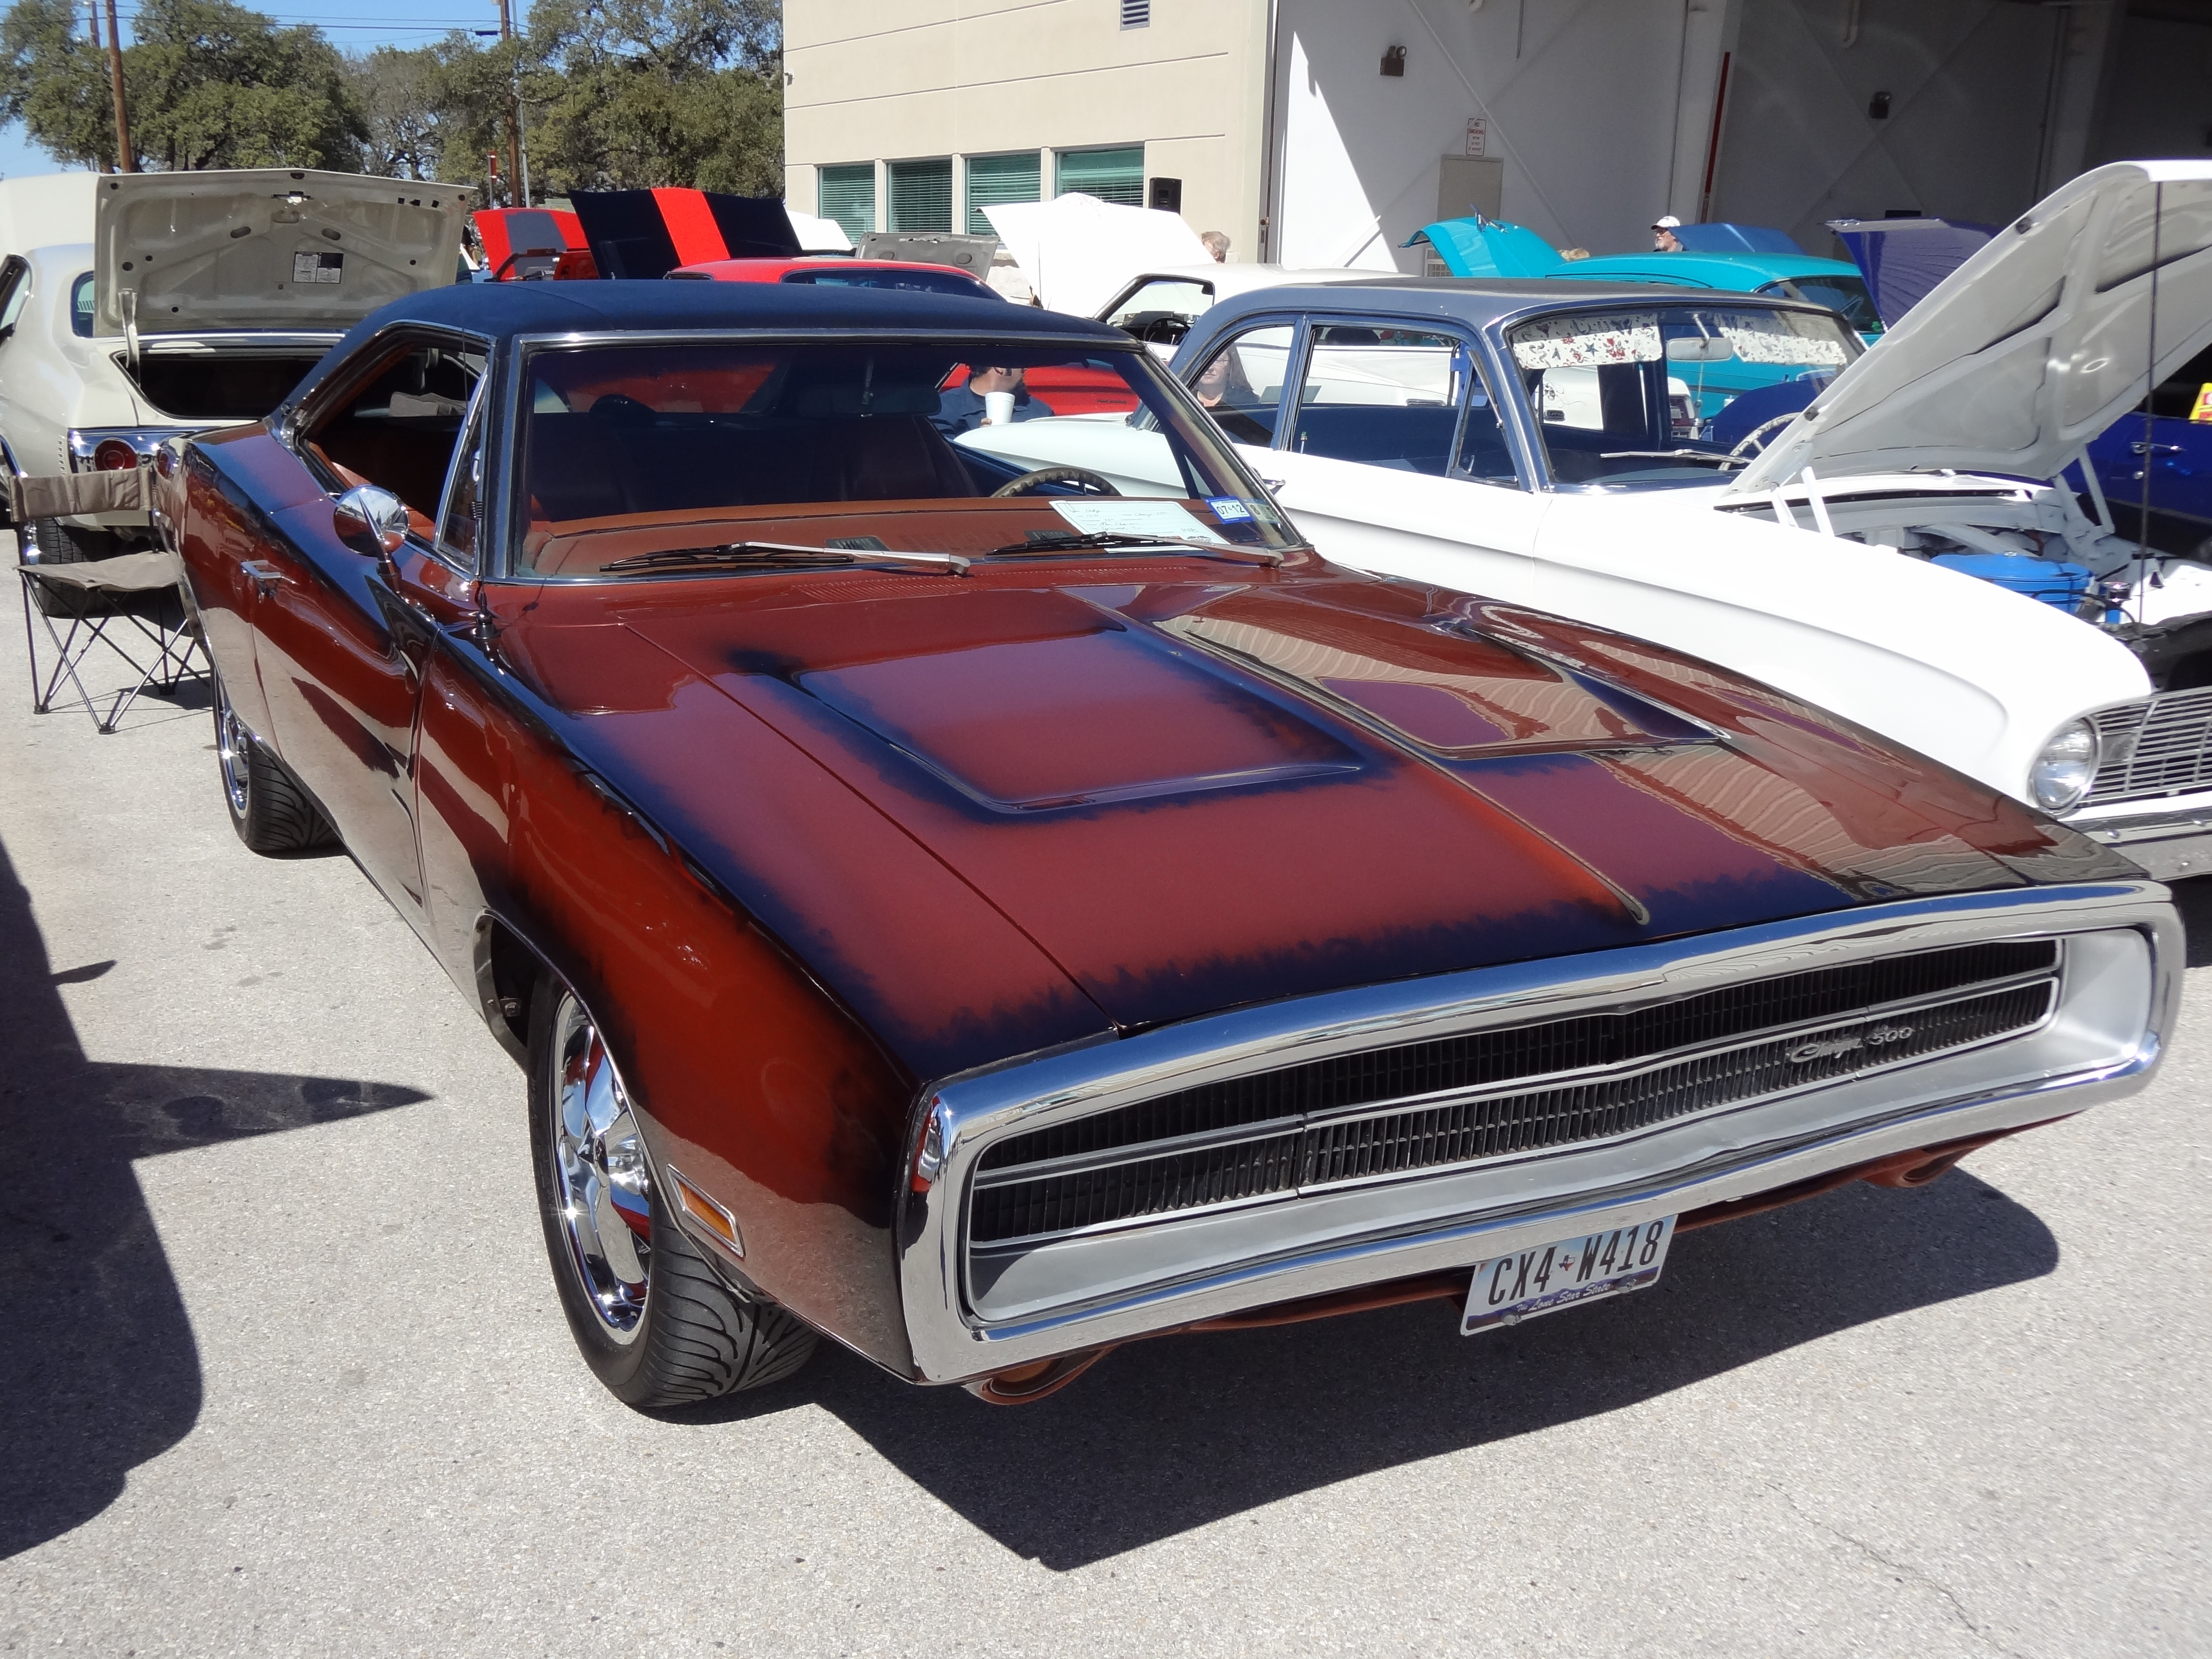 1970 Dodge Charger wallpaper   ForWallpapercom 4608x3456